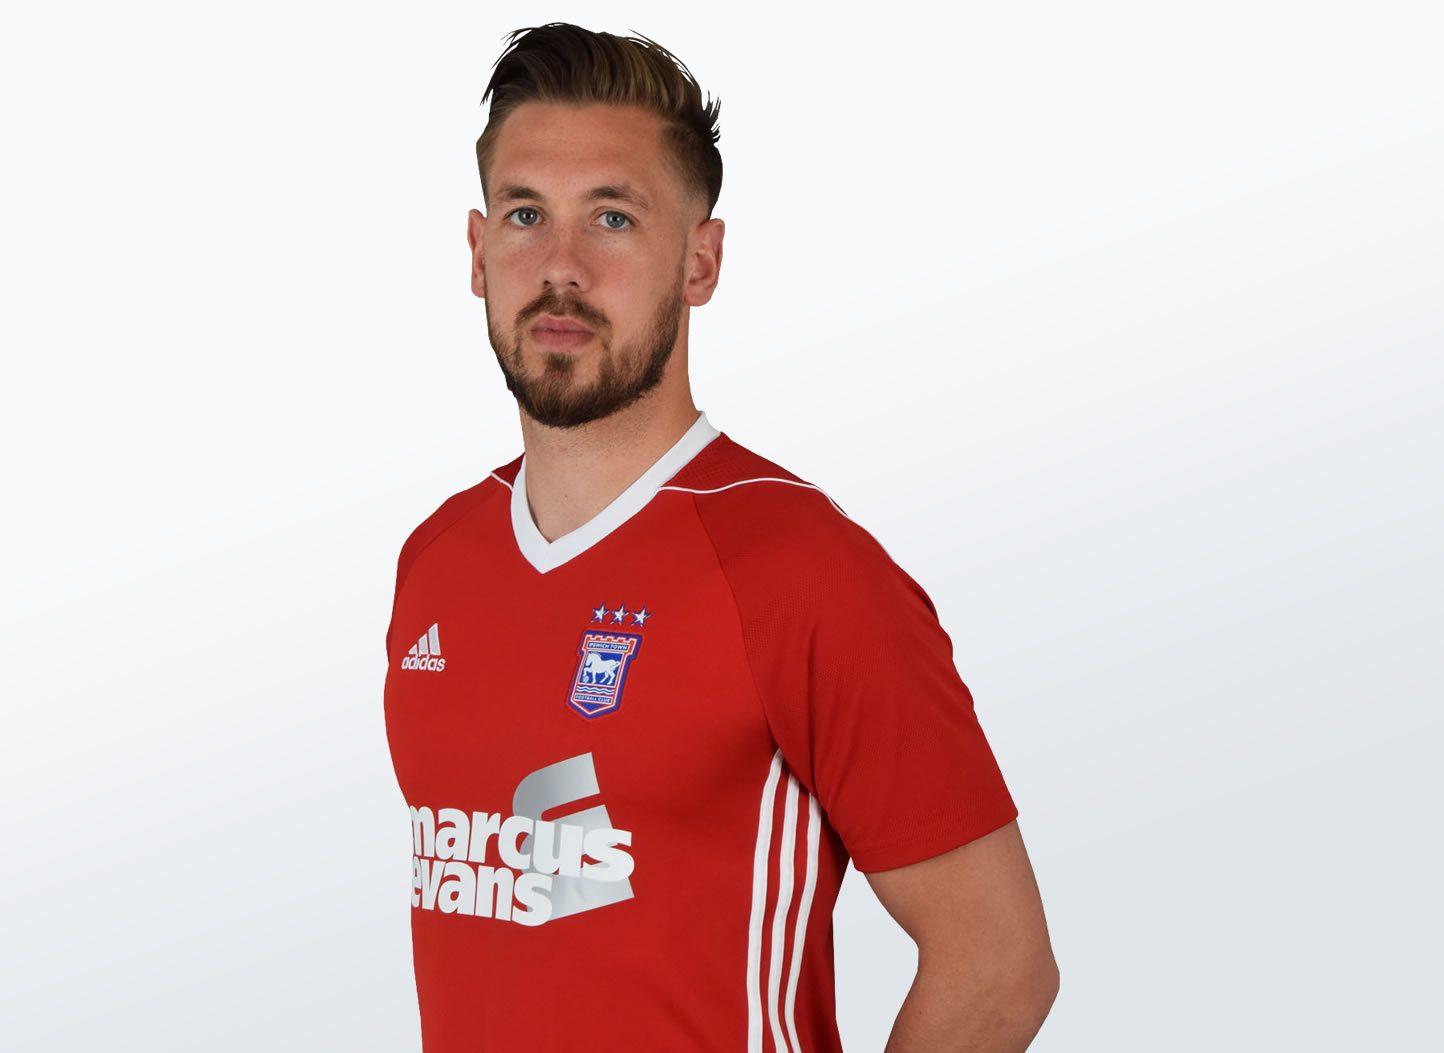 Camiseta suplente 2017-18 del Ipswich Town | Foto Web Oficial